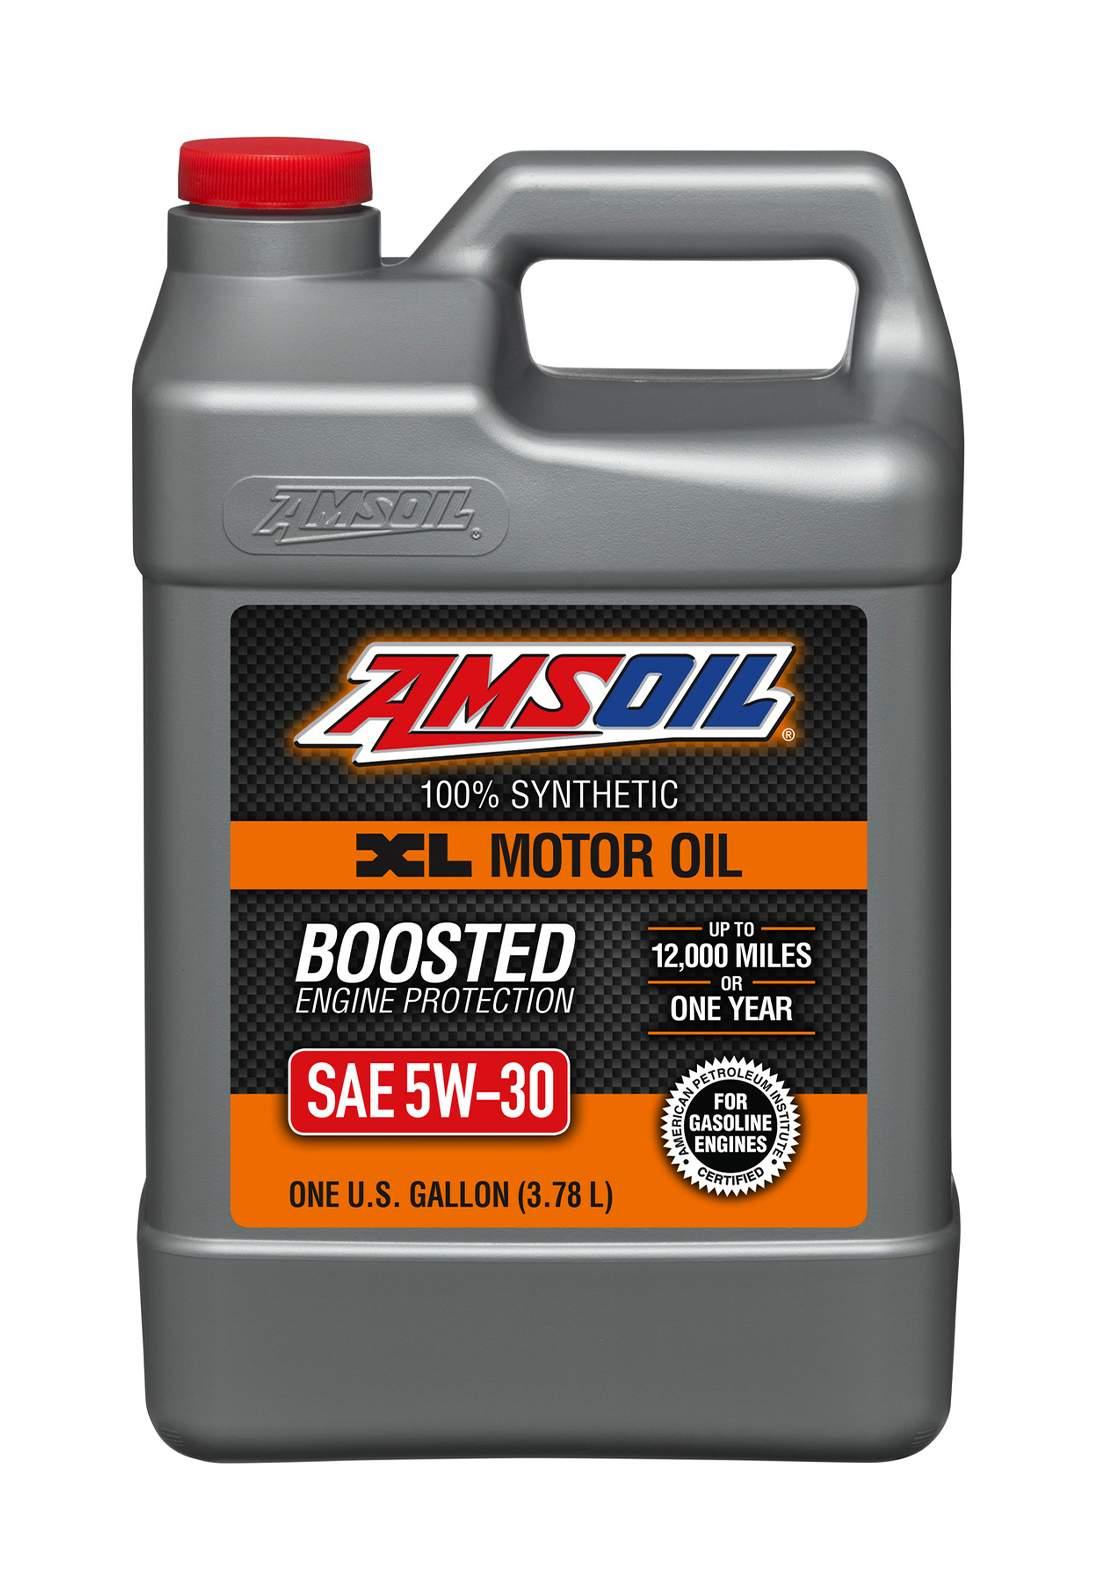 AMSOil 5W-30 Synthetic XL Motor Oil 3.78 l زيت محرك